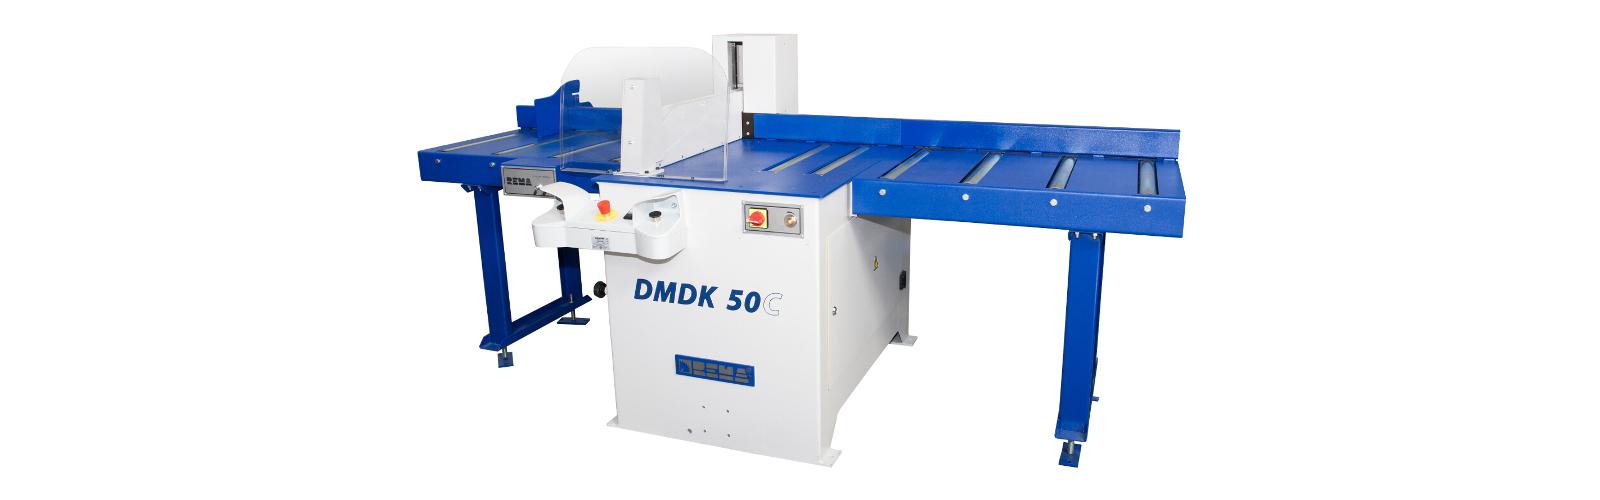 DMDK-50C